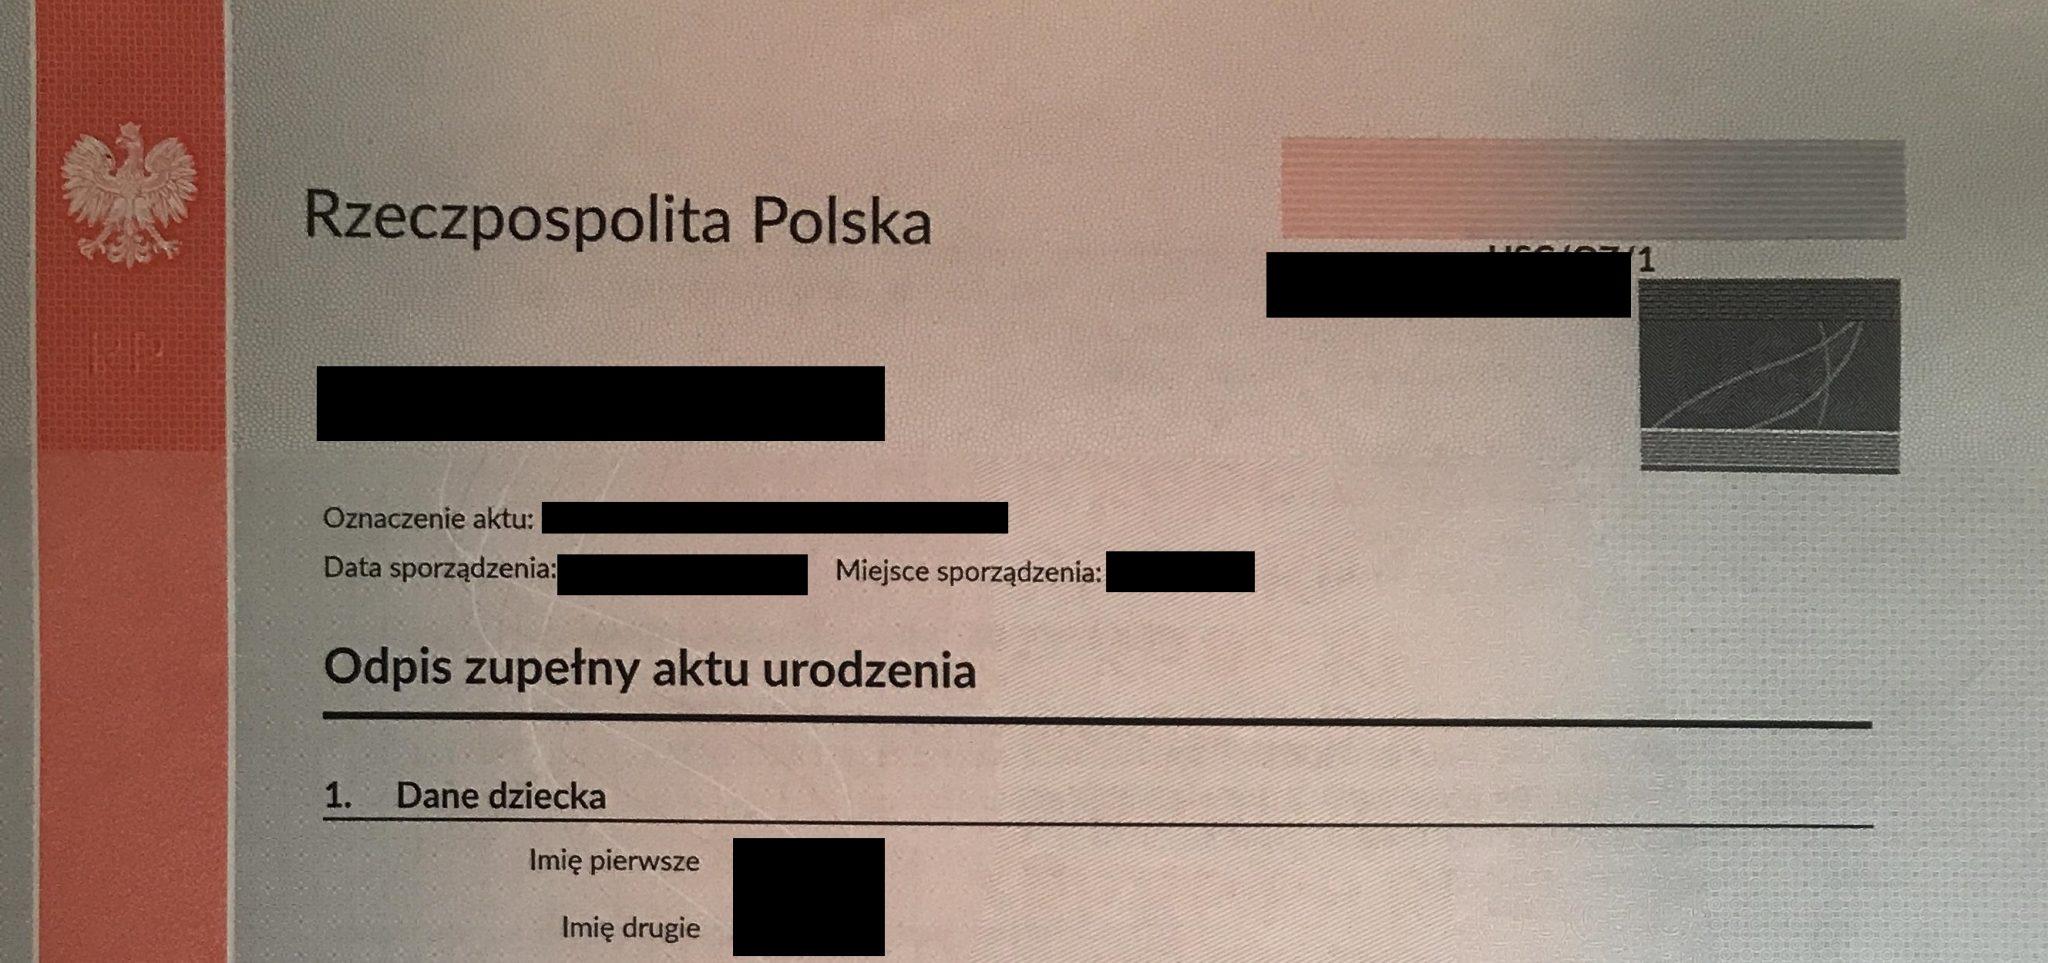 Polish Birth Certificate